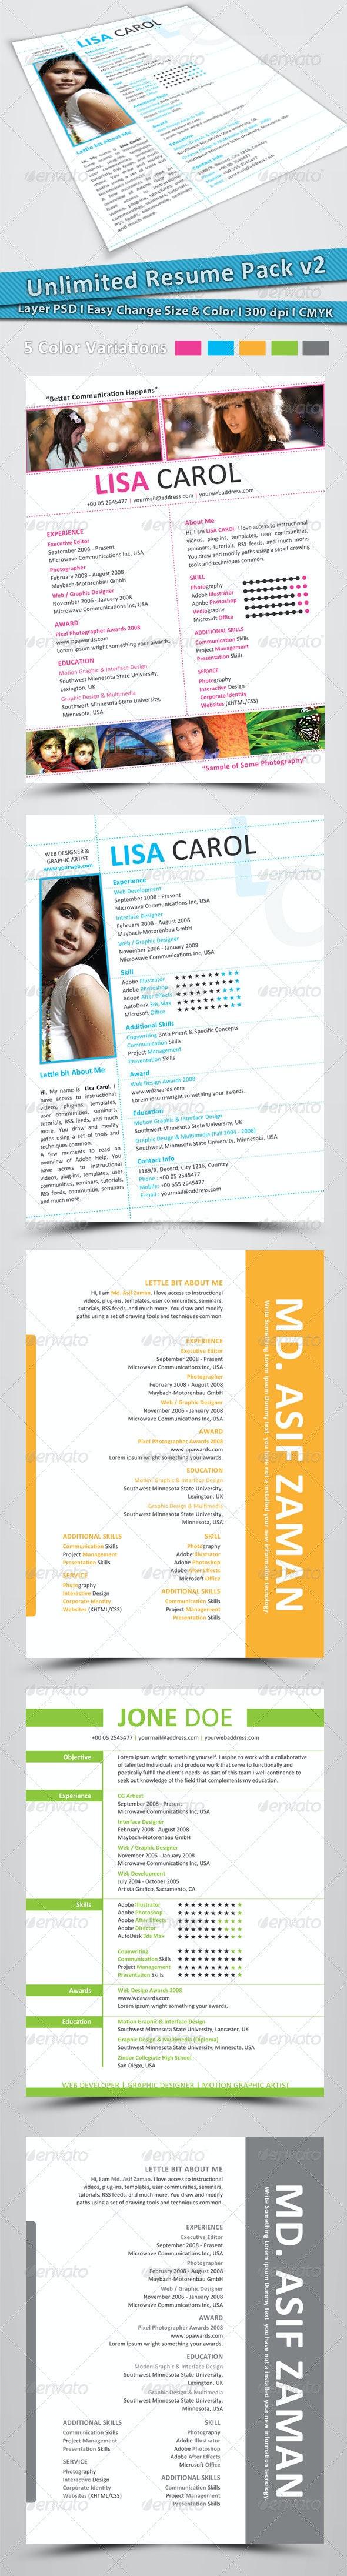 Unlimited Resume Pack v2 - Resumes Stationery